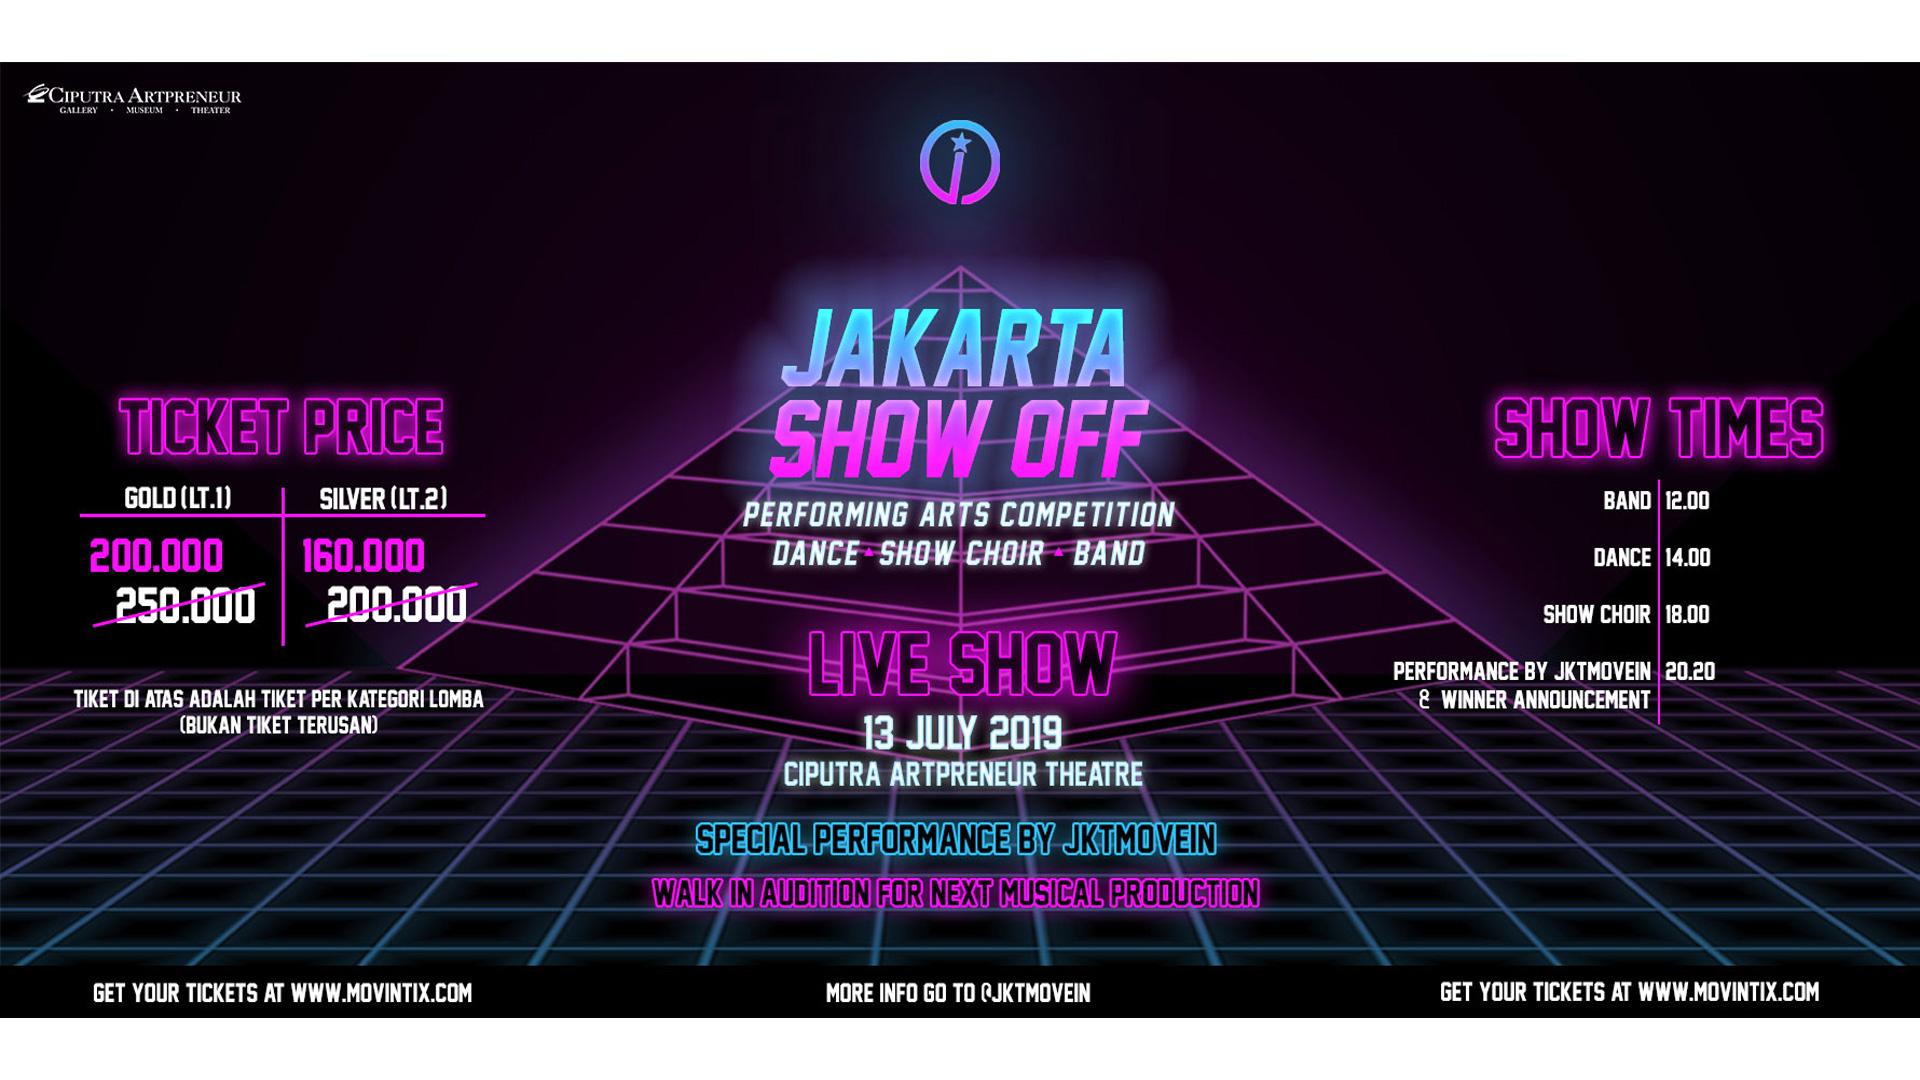 Jakarta Show Off